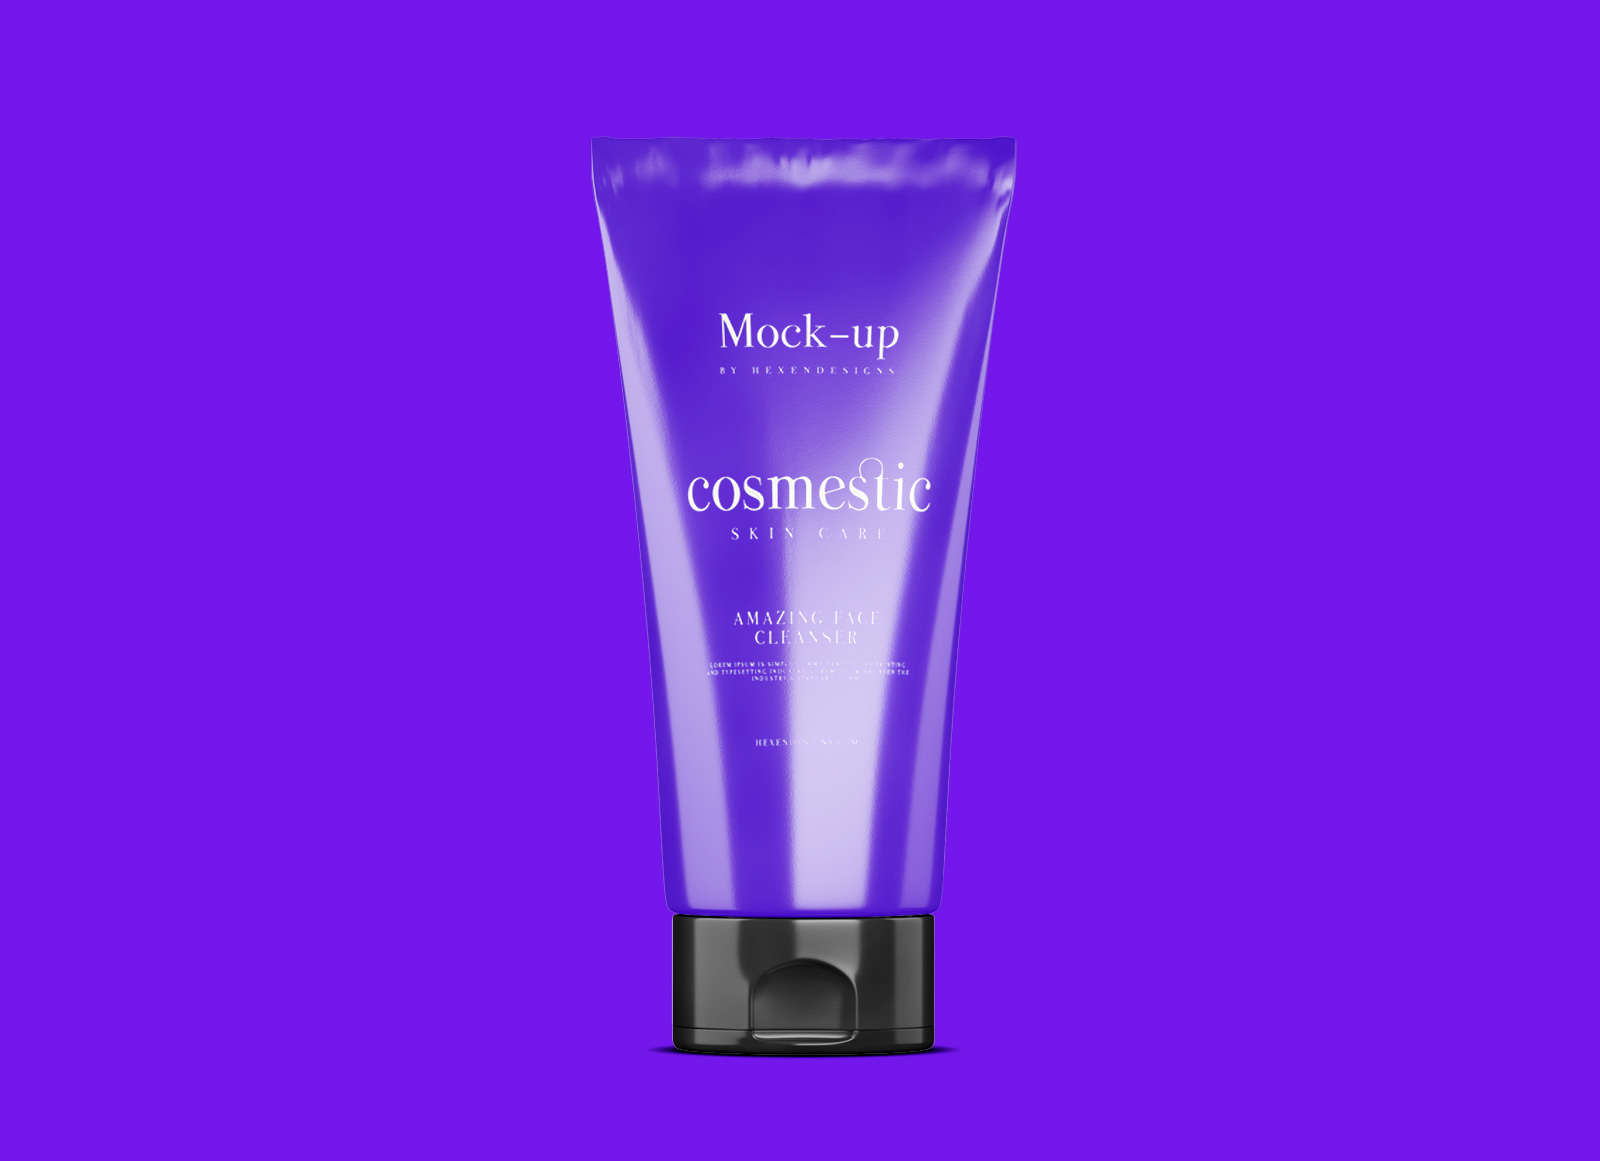 Free-Cosmetic-Cream-Tube-Mockup-PSD